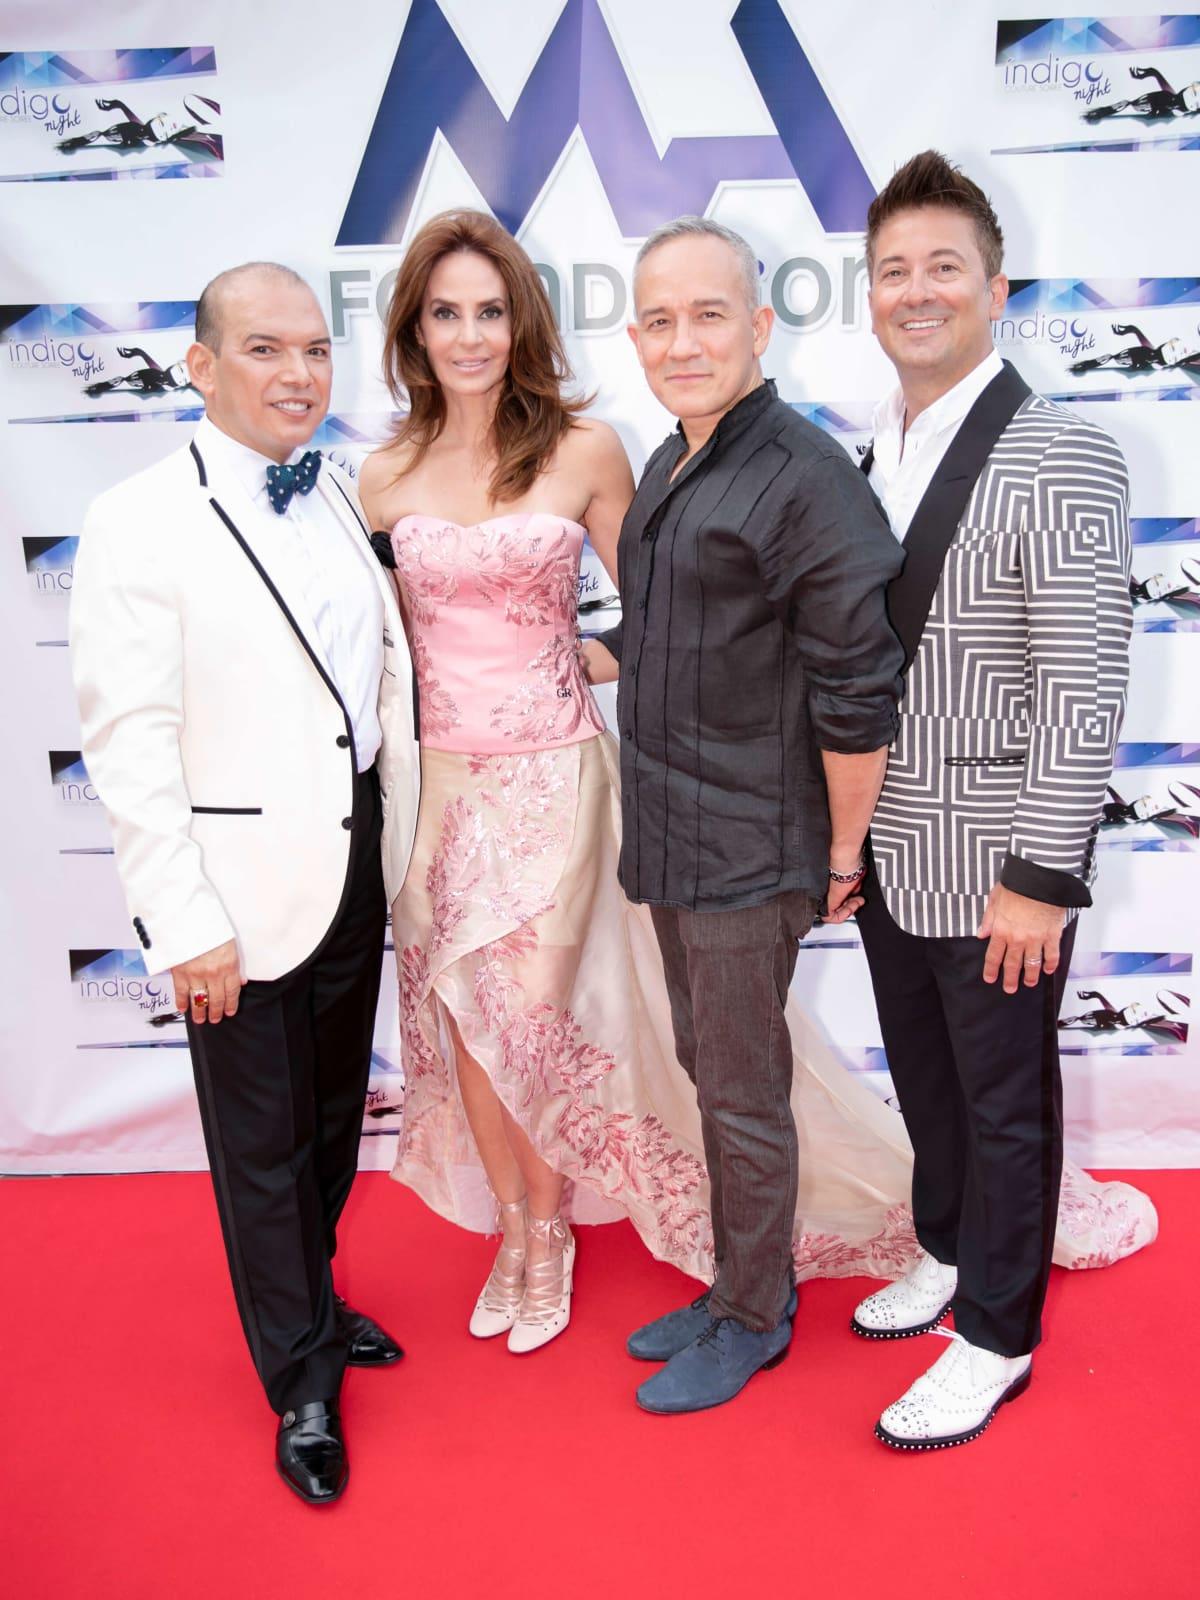 Indigo Nights. 8/31 Alex Martinez-Arpin, Carmen Maria Mantiel, Cesar Galindo, Tommy O'Neill